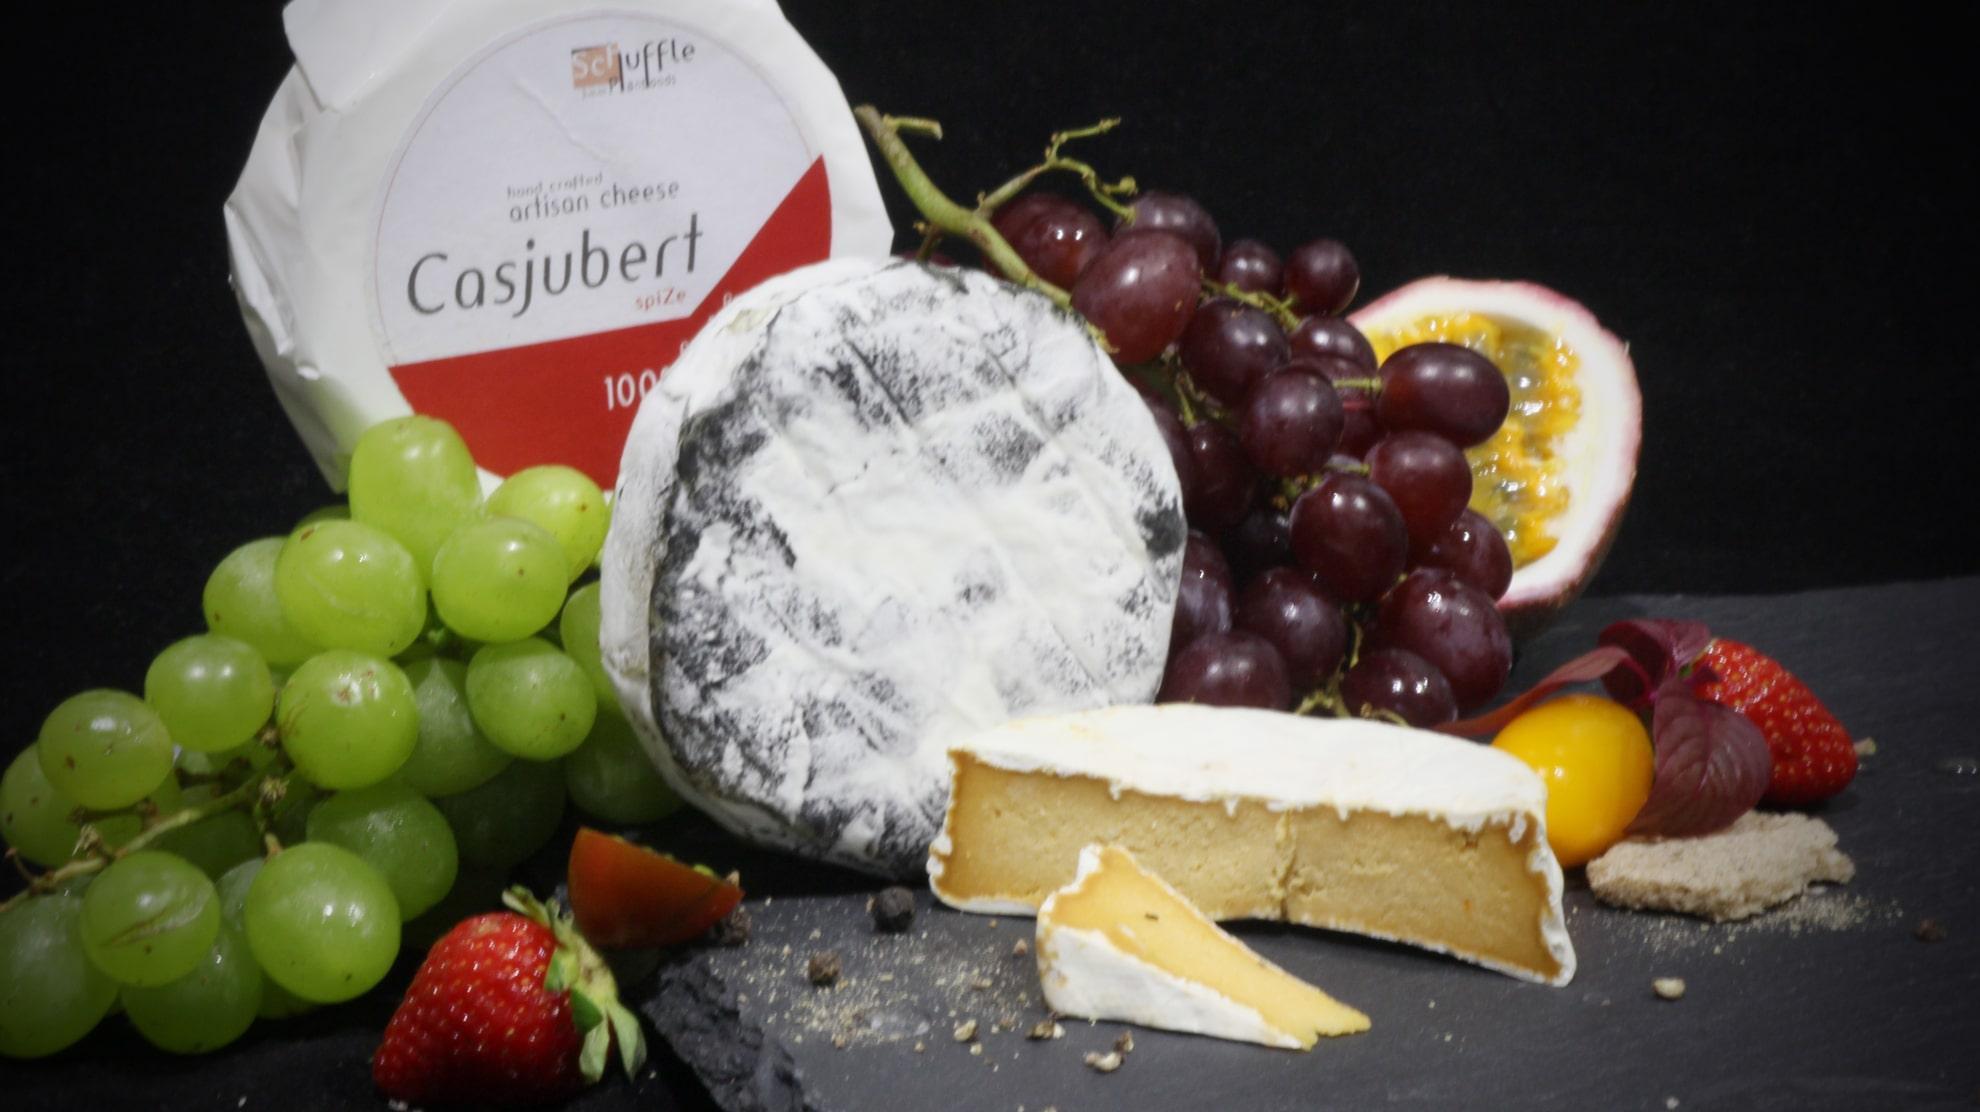 Casjubert plant-based, raw camembert cousing